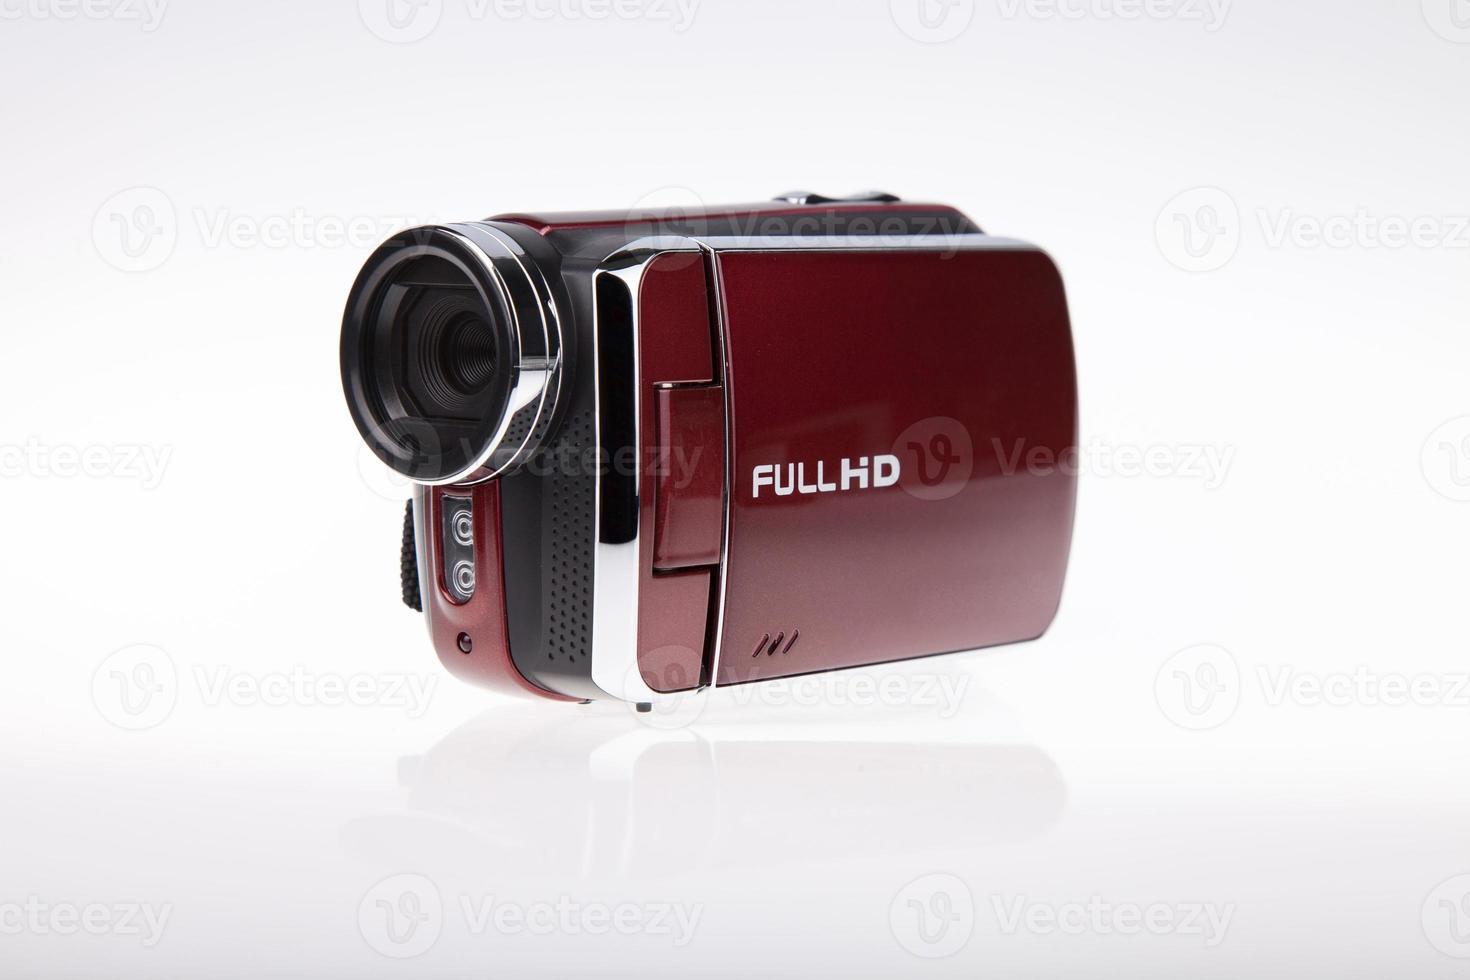 full HD-videokamera - stockbild foto